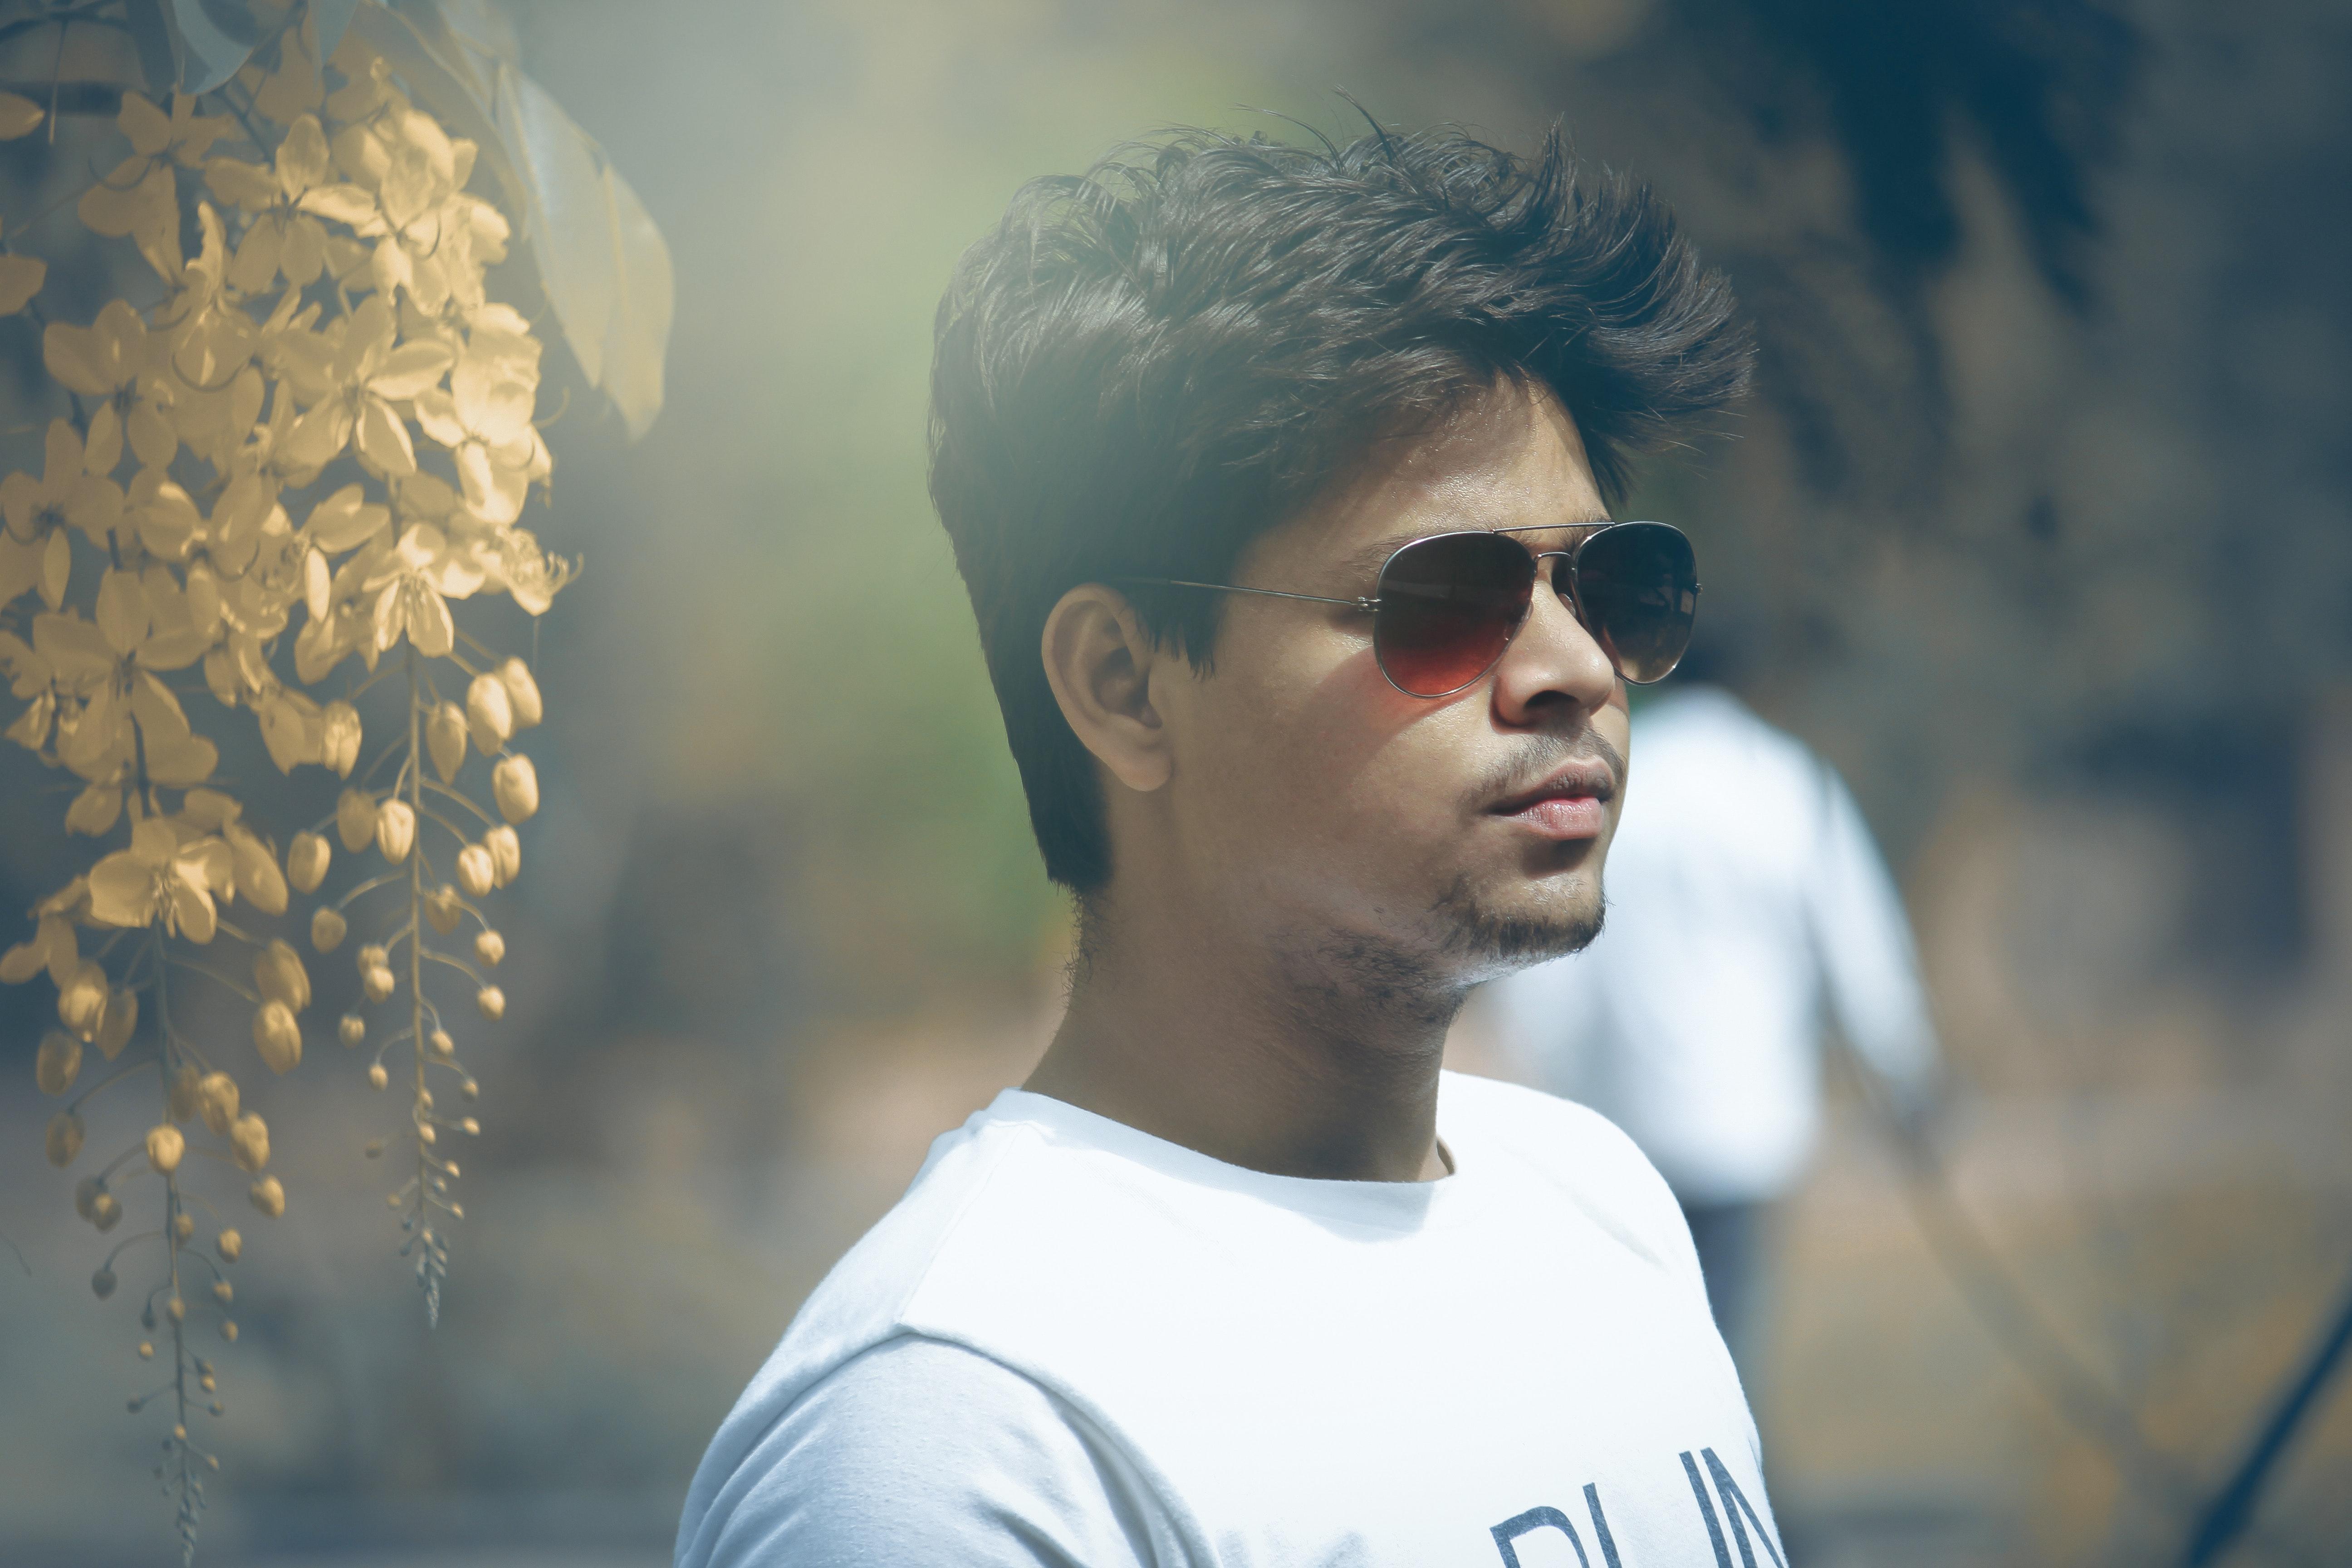 Free Images : blur, blurred background, boy, casual, eyewear